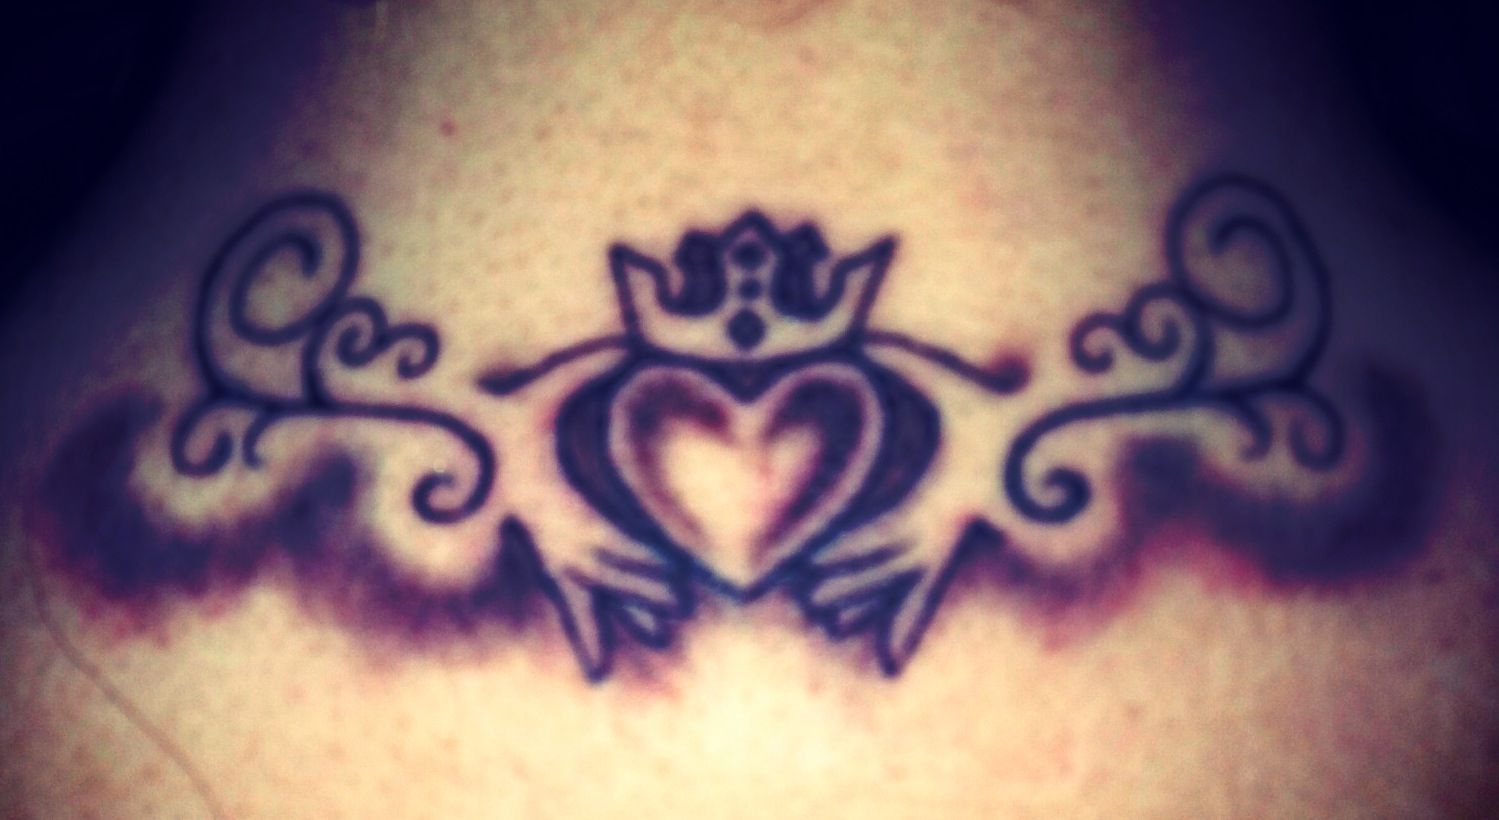 my claddagh tattoo meaning love loyalty friendship tattoos pinterest claddagh tattoo. Black Bedroom Furniture Sets. Home Design Ideas